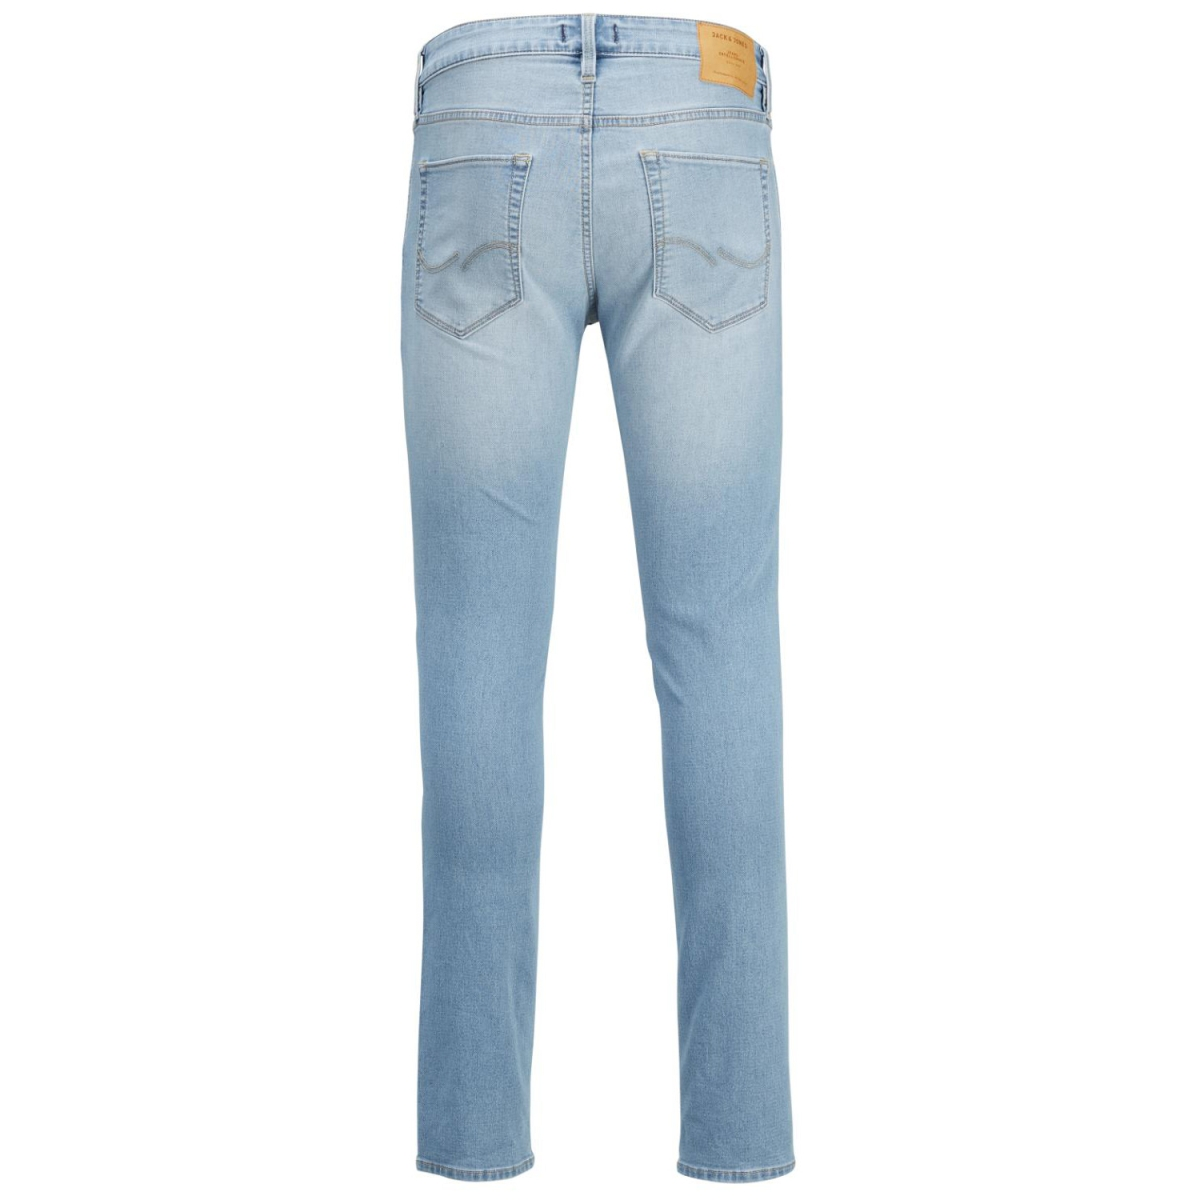 jjiglenn jjicon cr 045 indigo knit 12135754 jack & jones jeans blue denim